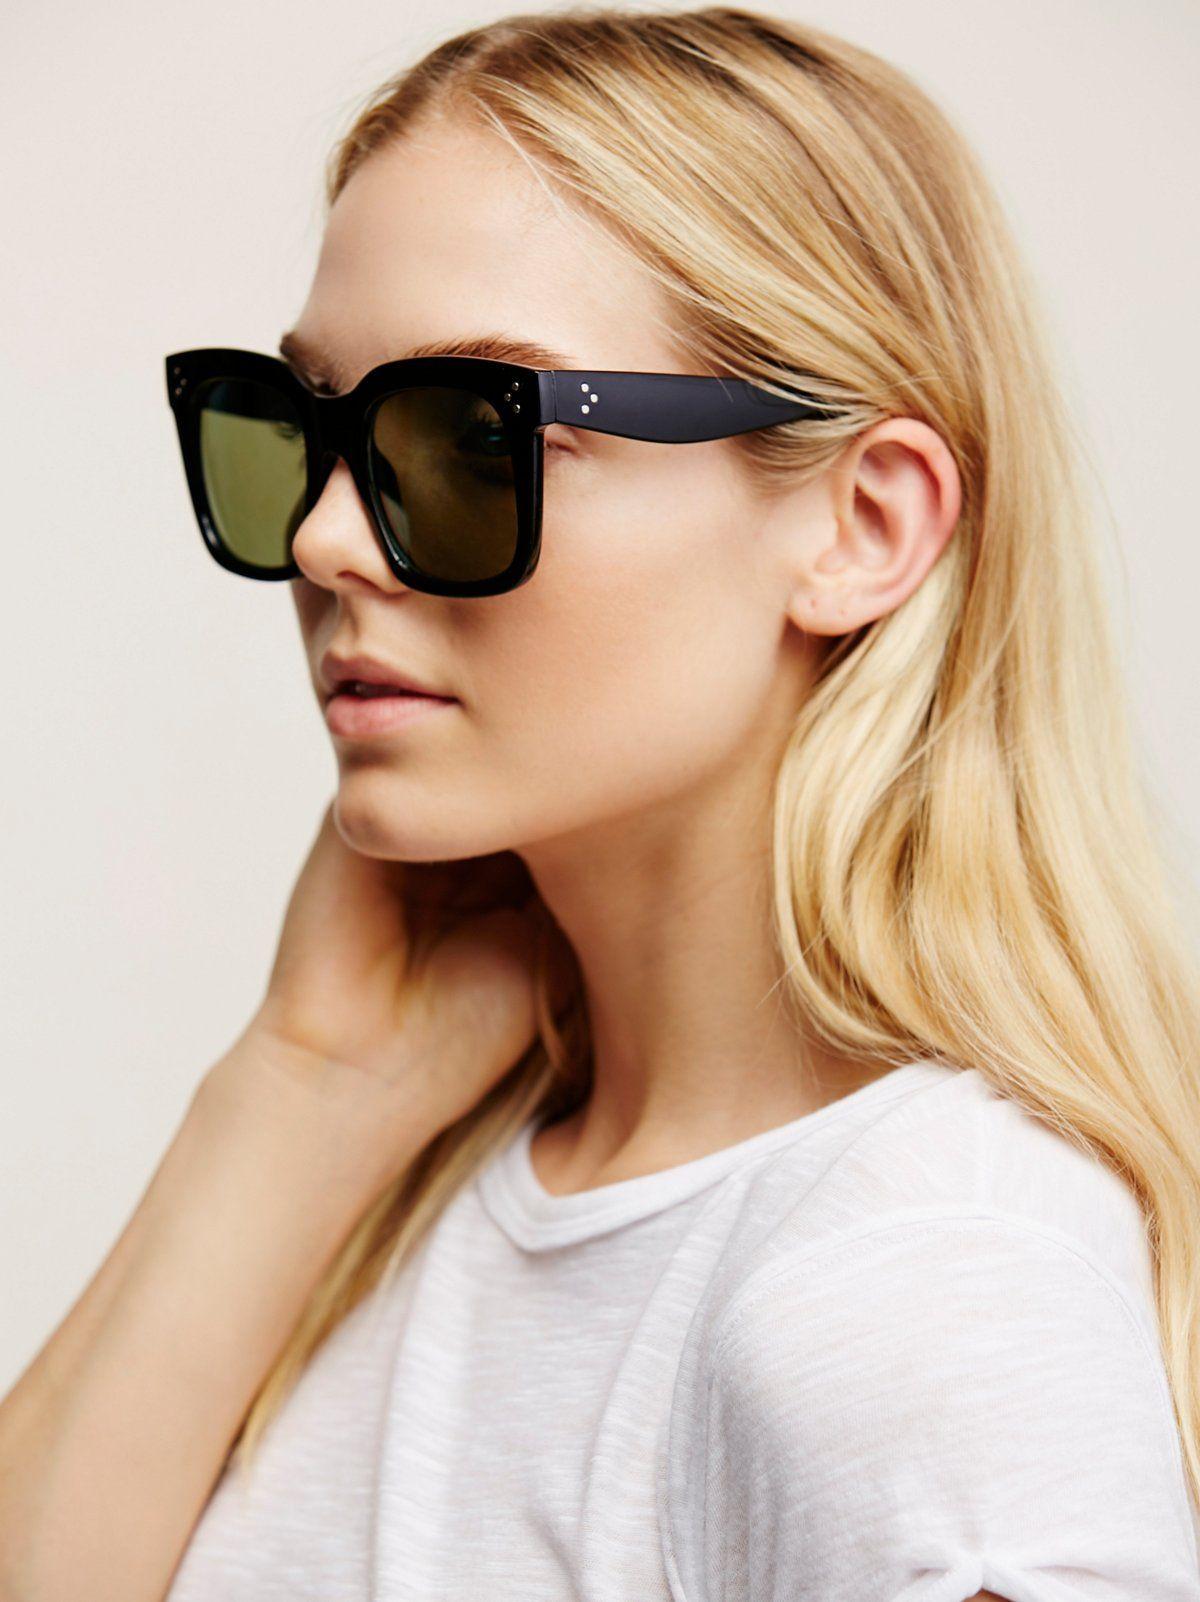 Style Oversized Sunglasses WayfarerStreet Accessories Charlie A5R3L4qj